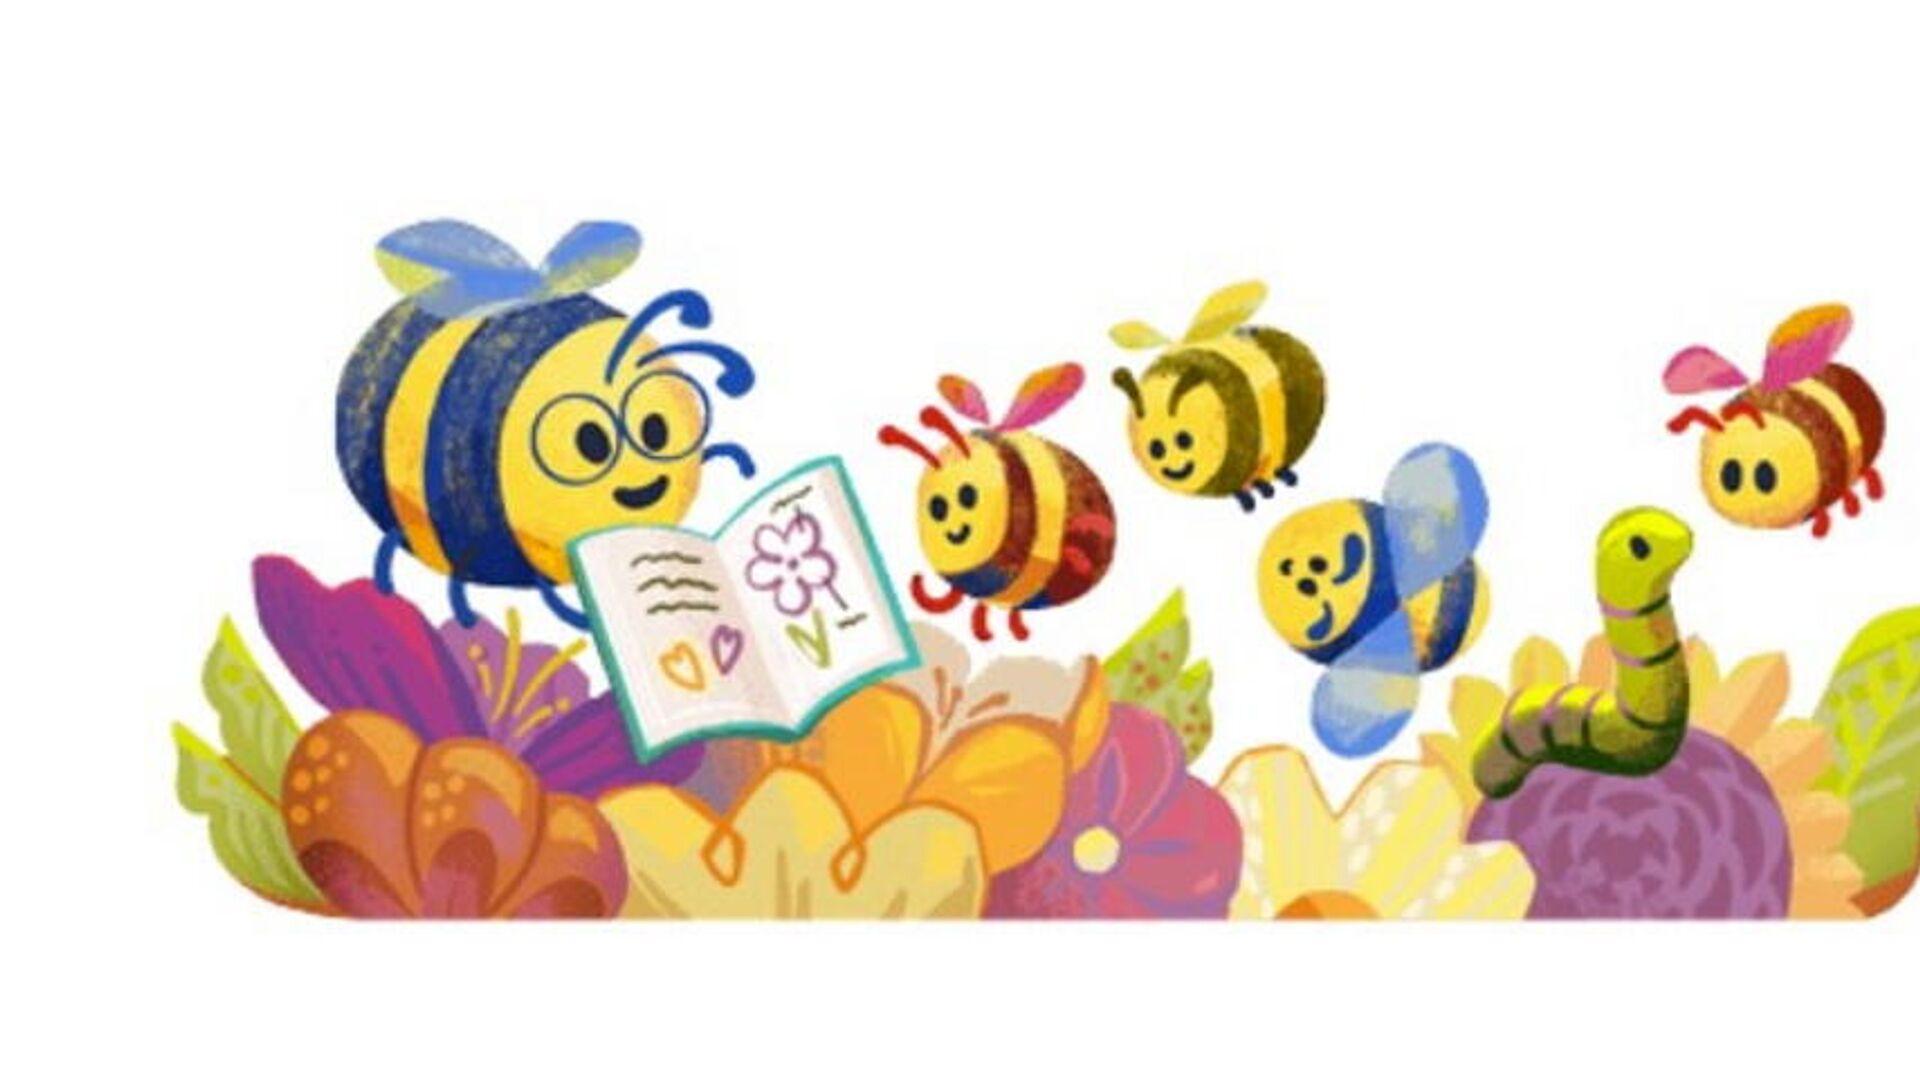 Google Doodle για την Ημέρα των Εκπαιδευτικών 2021 - Sputnik Ελλάδα, 1920, 05.10.2021